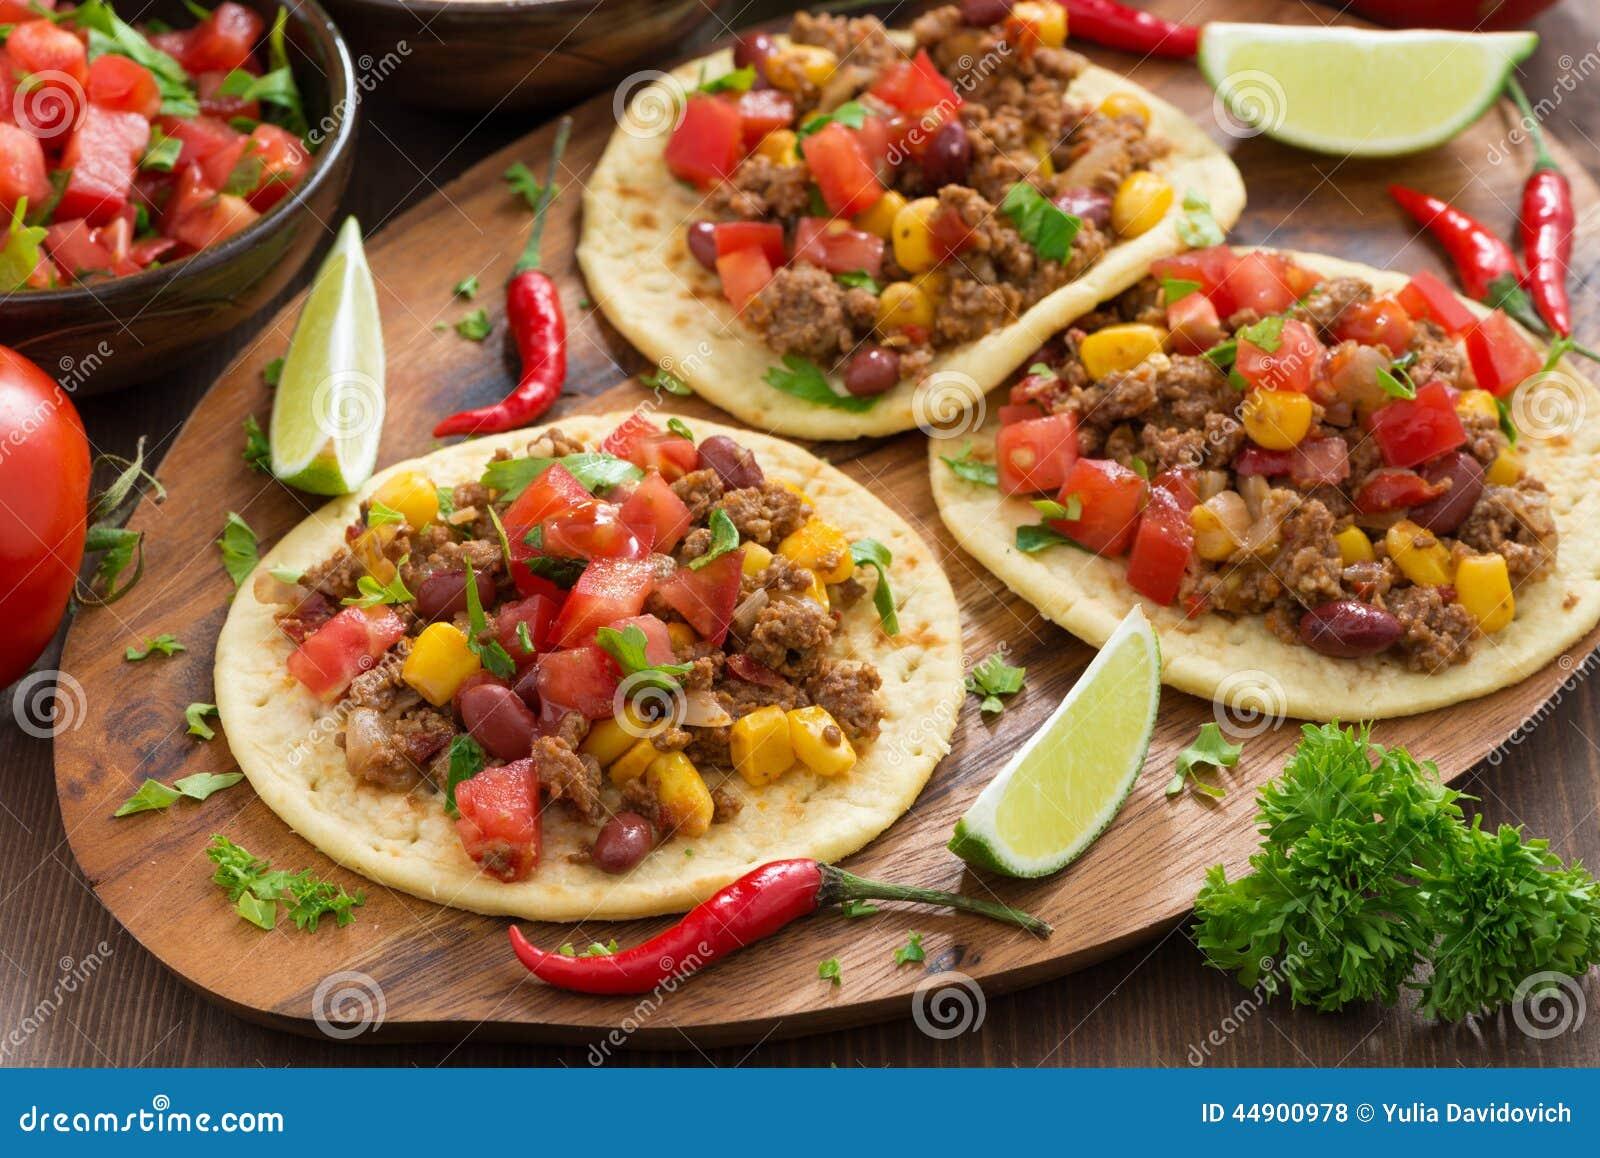 cuisine mexicaine tortillas | ohhkitchen